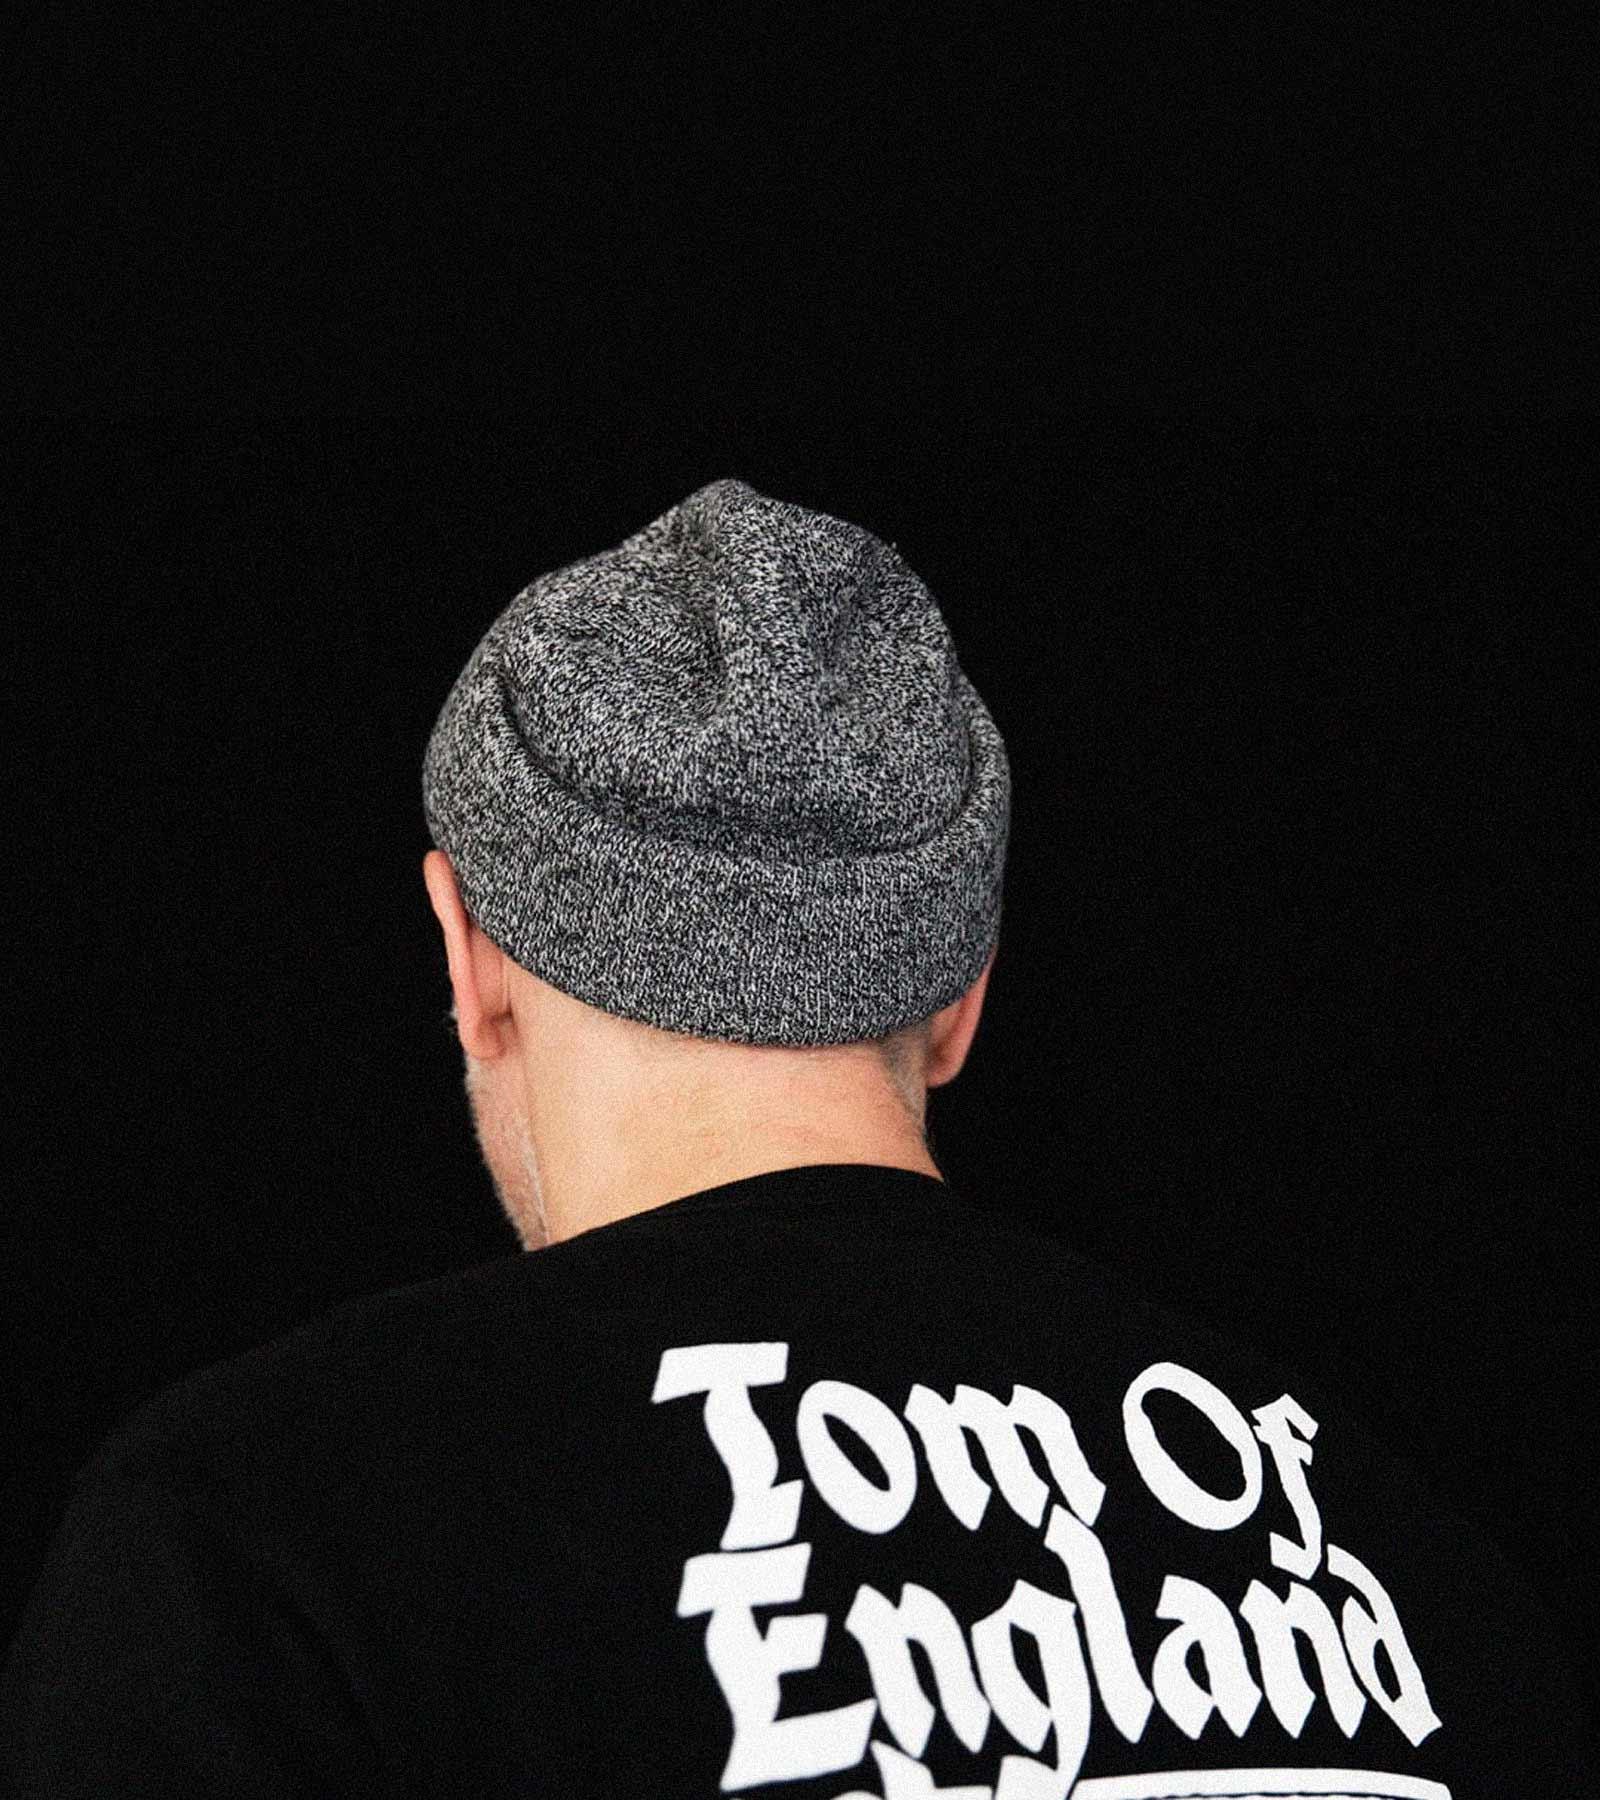 № 89 - Tom of England - aka Thomas Bullock